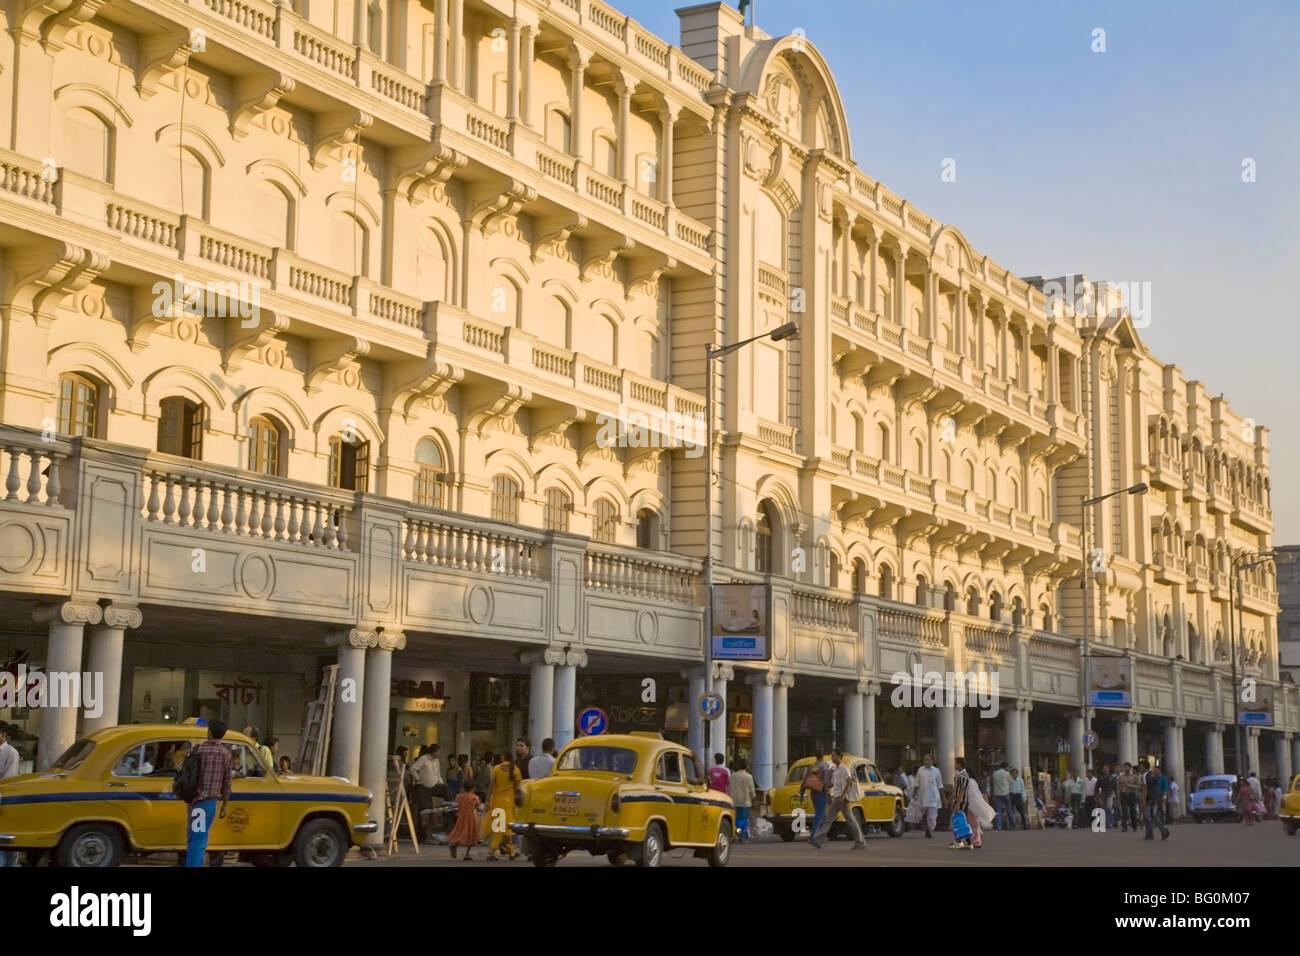 Buildings on Jawaharlal Nehru Road (Chowringhee Road), Chowringhee, Kolkata (Calcutta), West Bengal, India, Asia - Stock Image